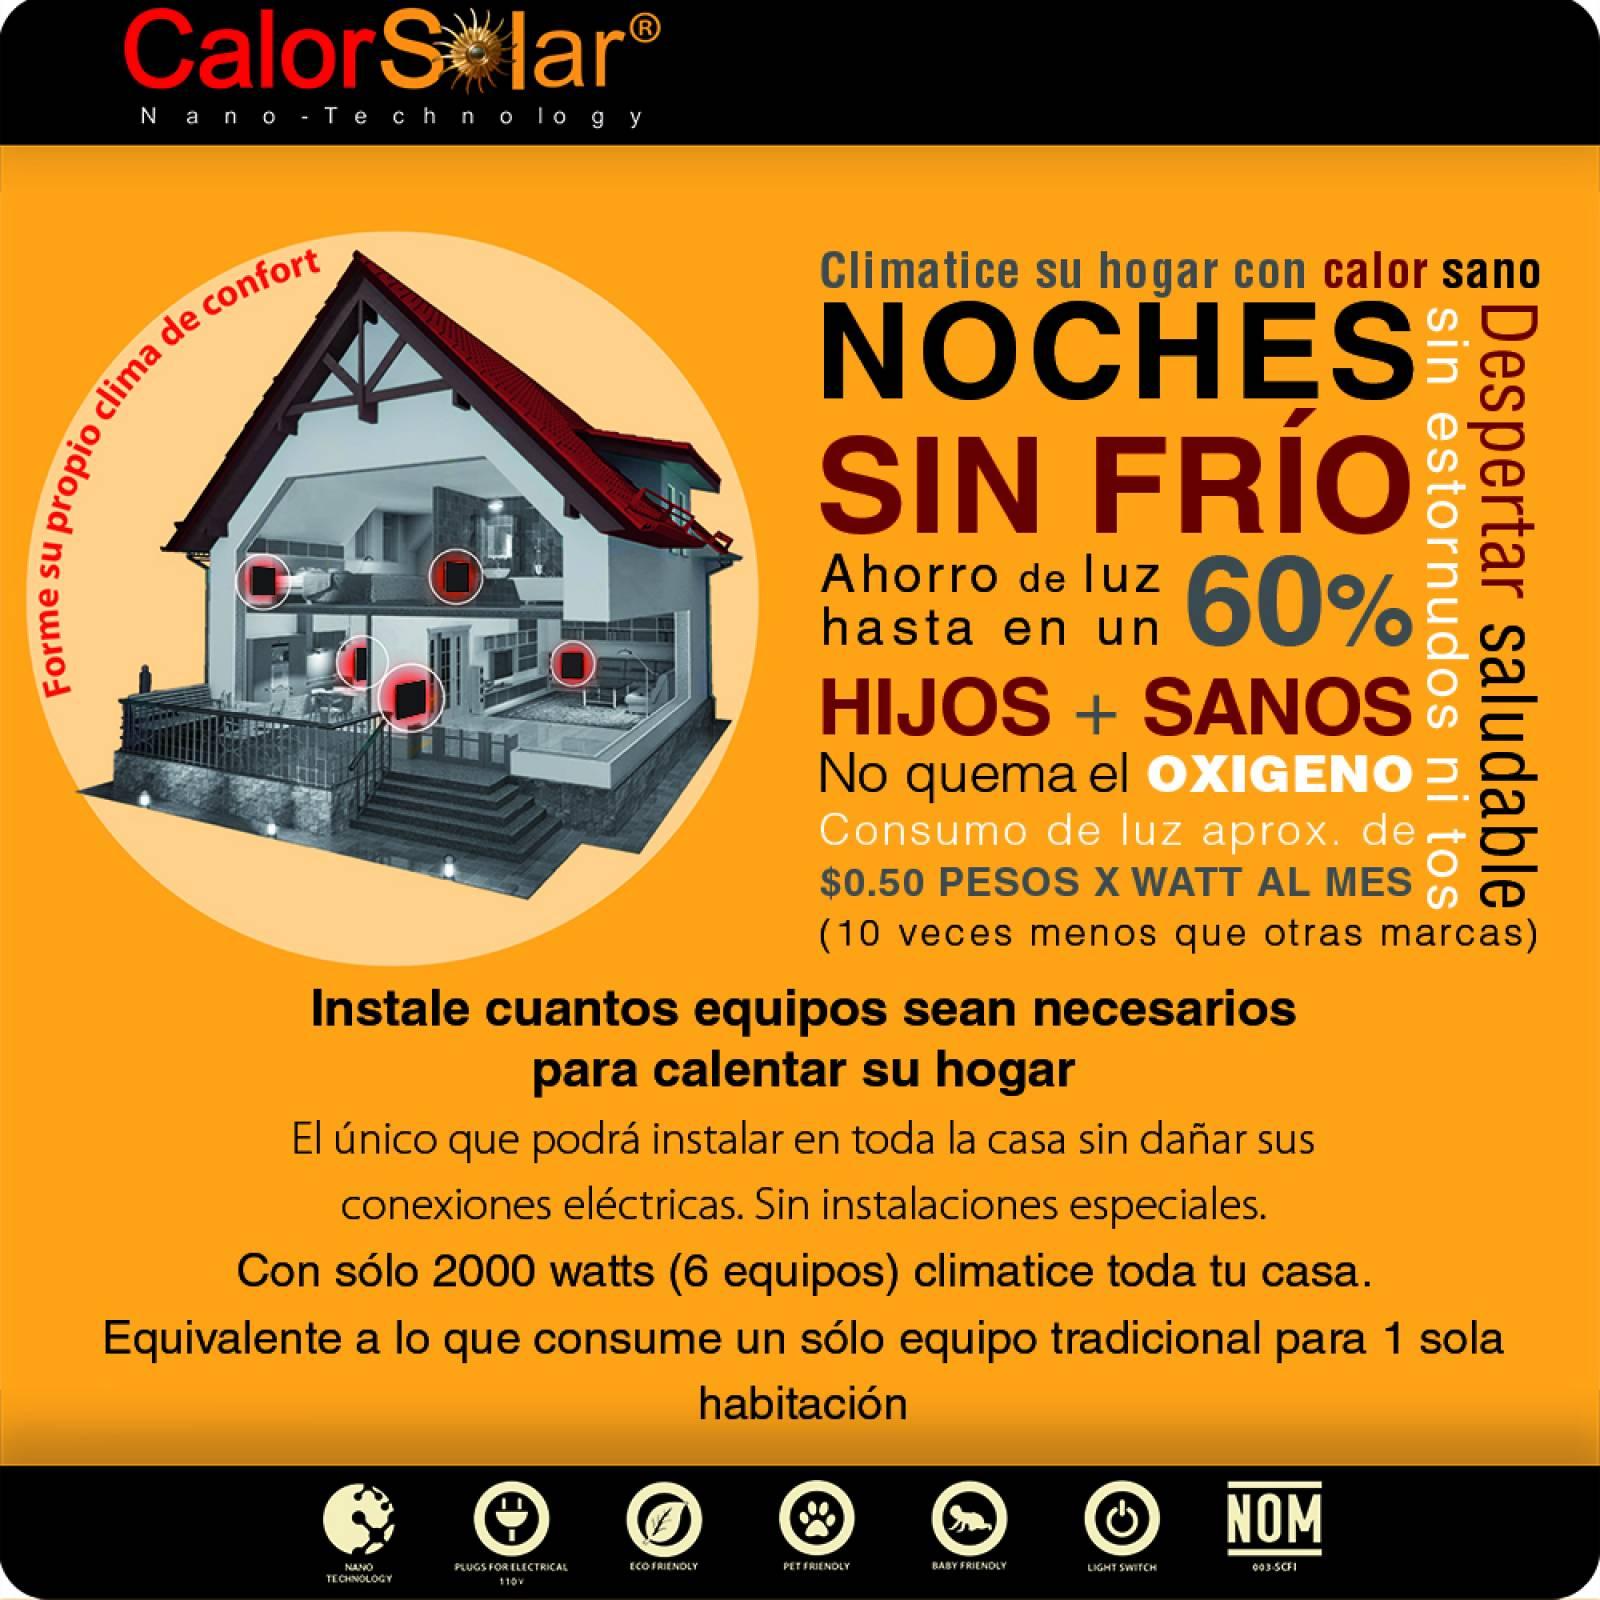 Calefactor de Panel infrarrojo en Cristal Vertical para Pared, Miami Wave Black Devil de 550W 60x90cm, Mod: 343CaSol-N3v